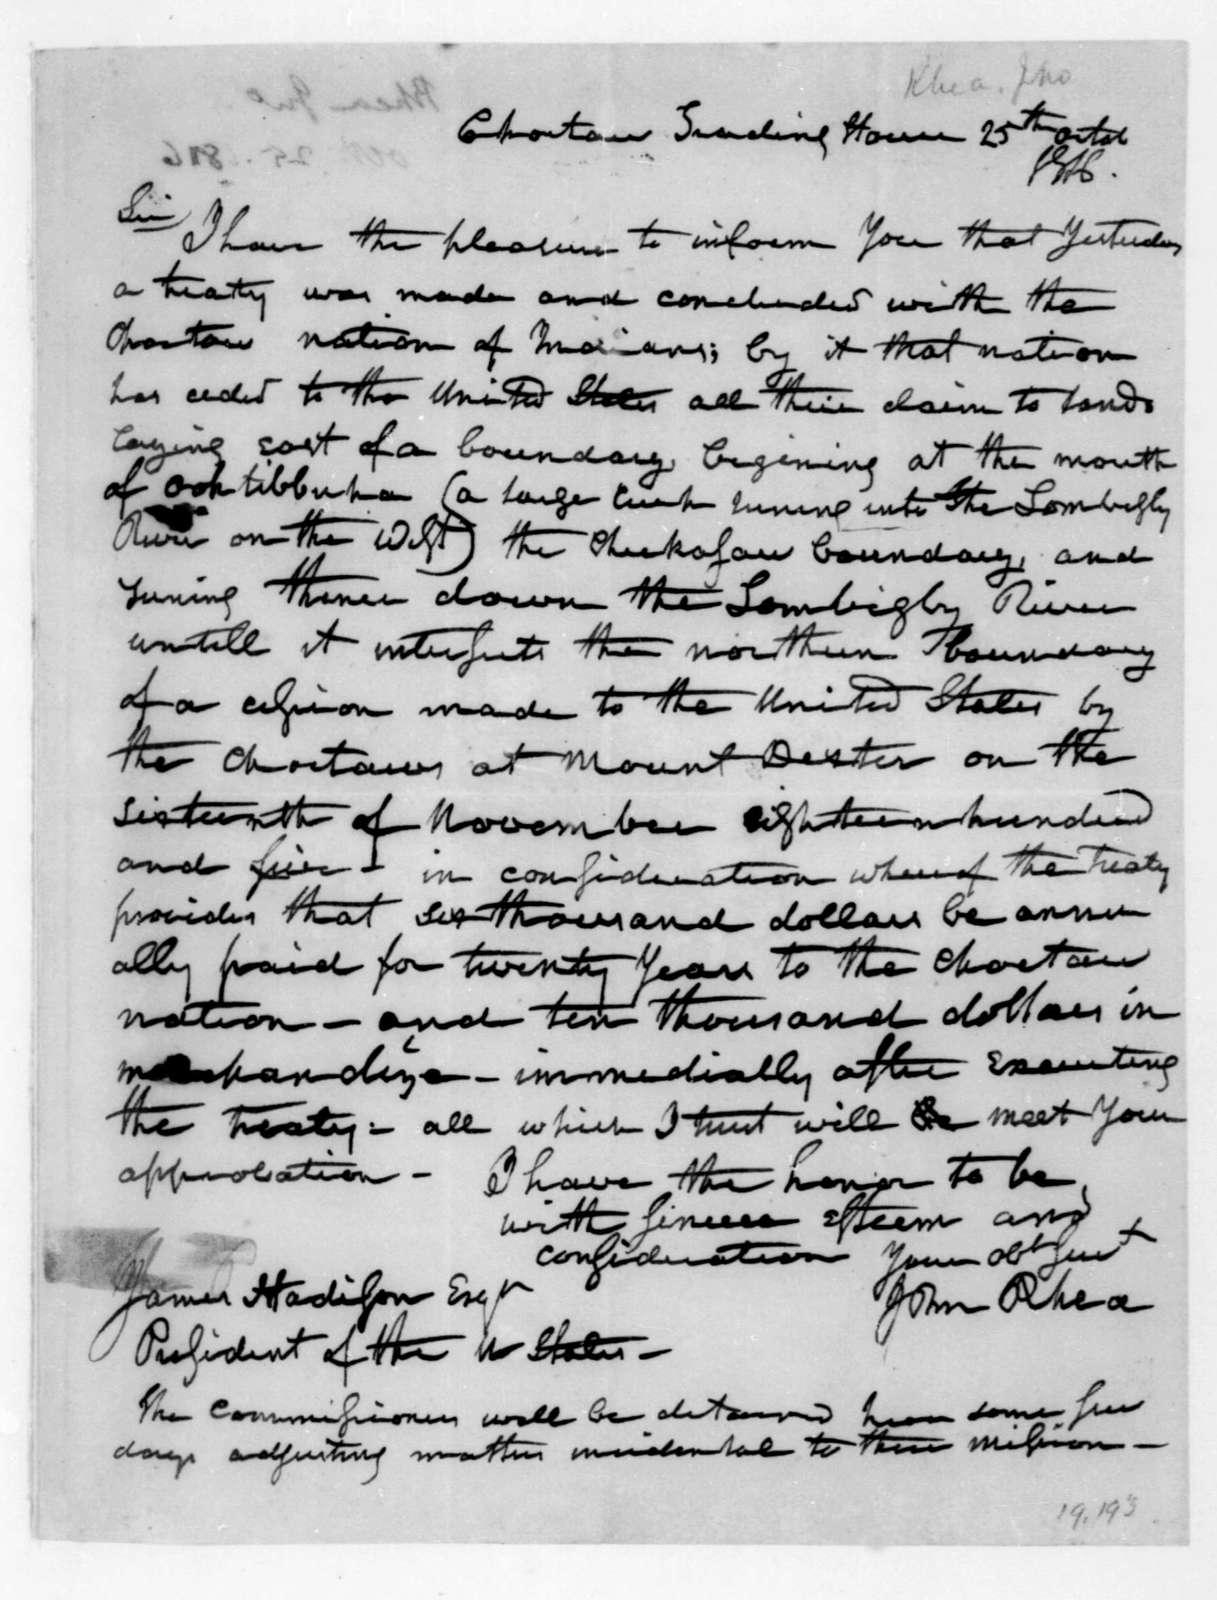 John Rhea to James Madison, October 25, 1816.